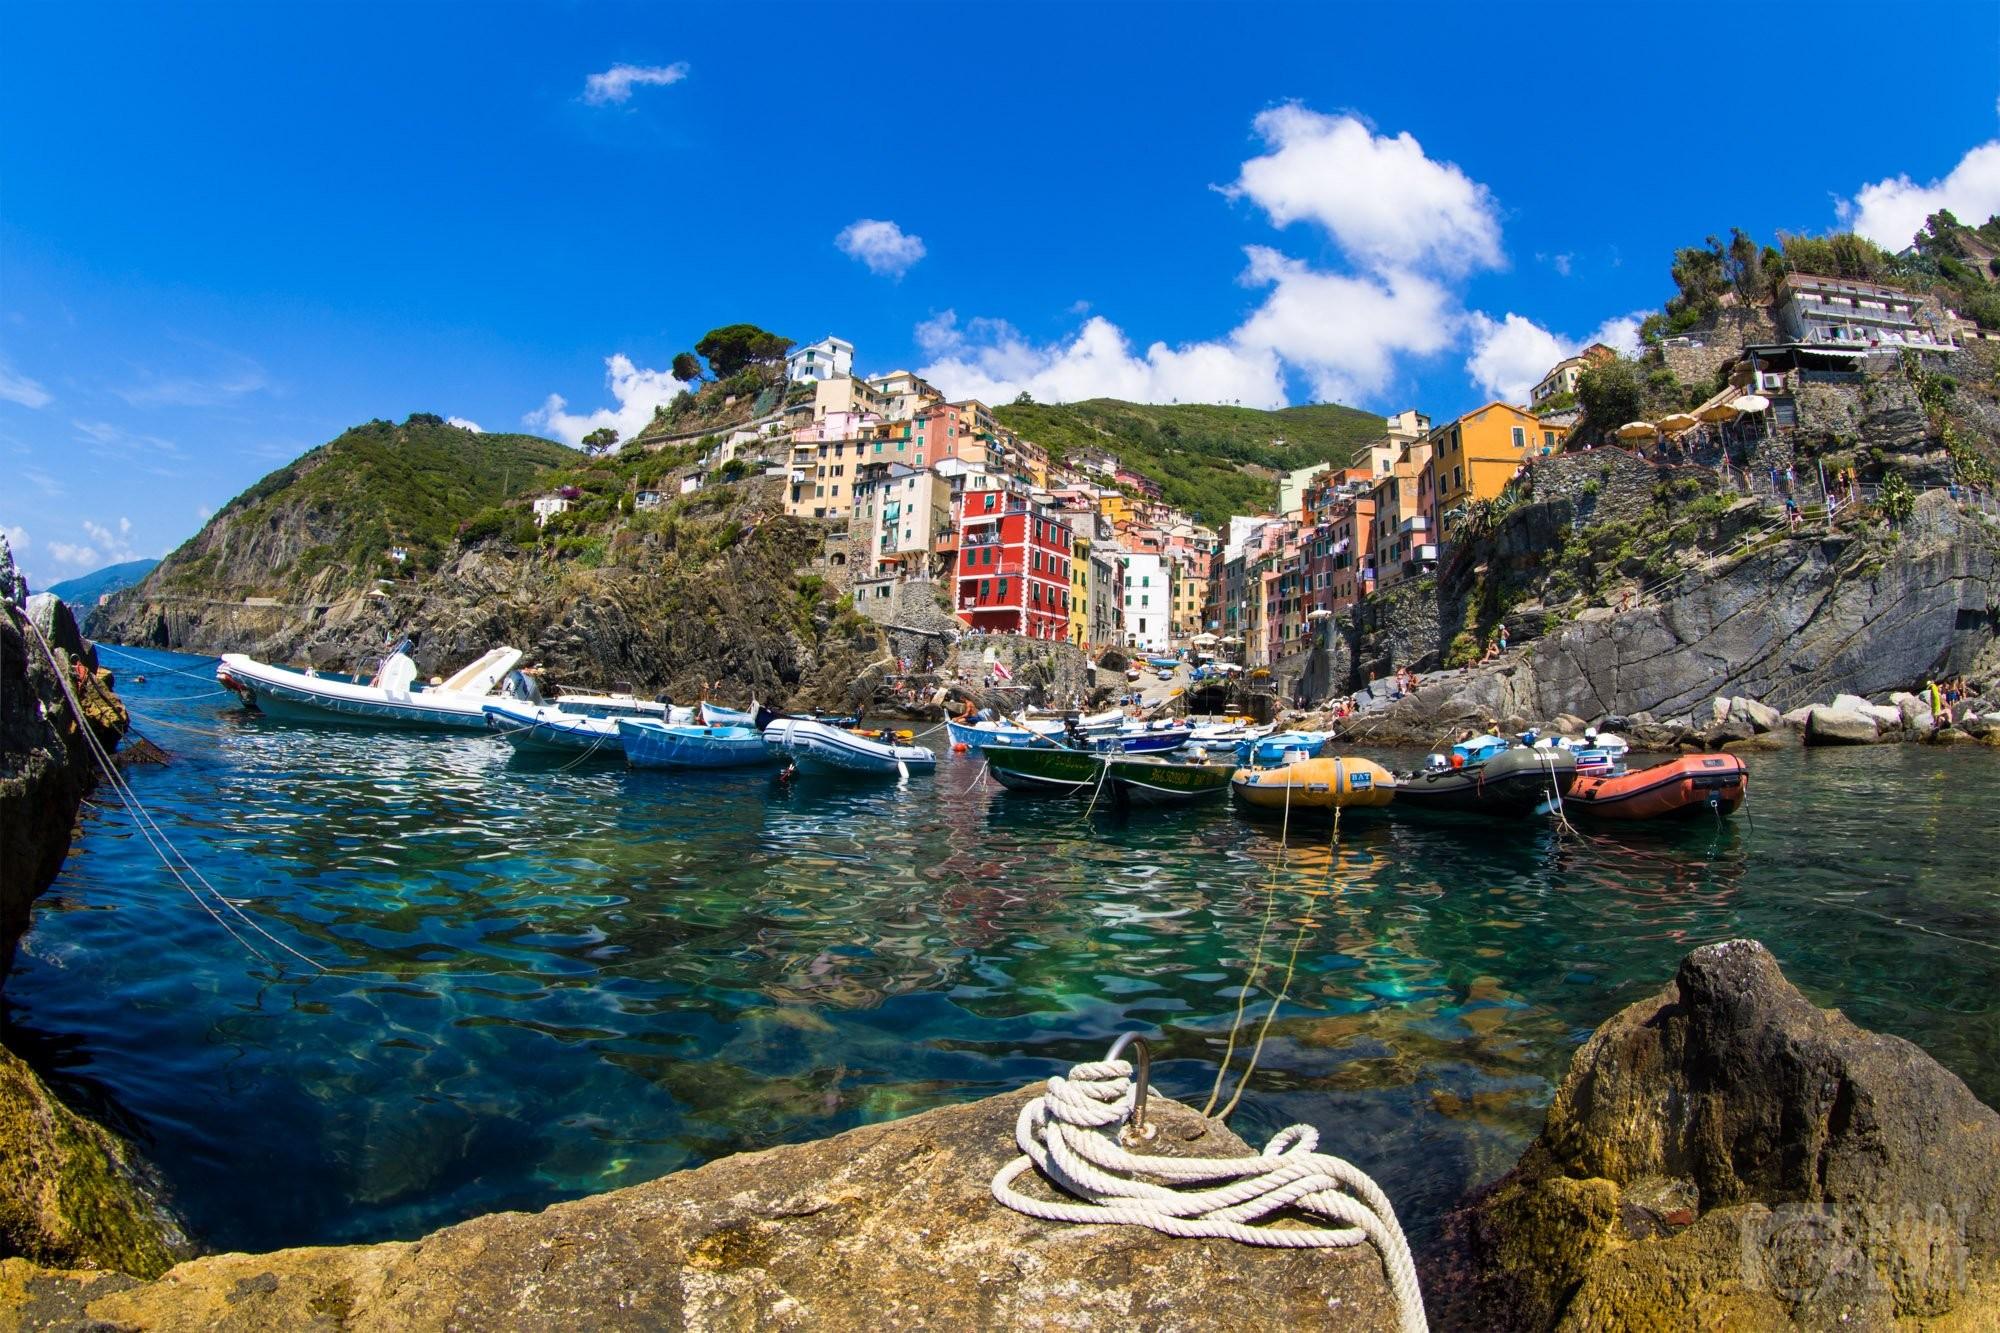 Riomaggiore village harbor in Cinque Terre Italy